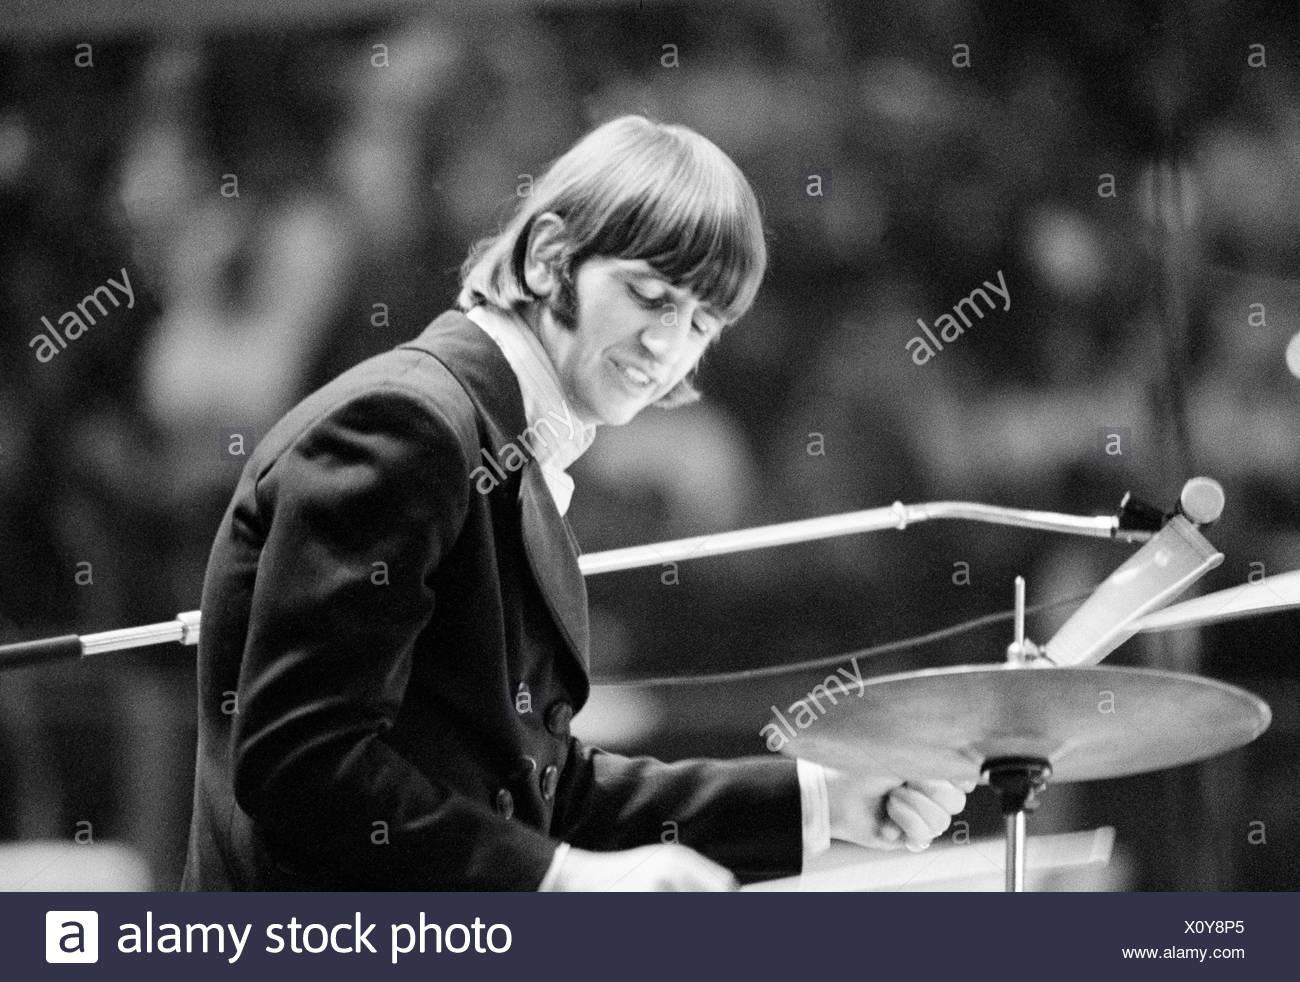 The Beatles music pop group band concert Germany Essen 1966 Ringo Starr drummer - Stock Image